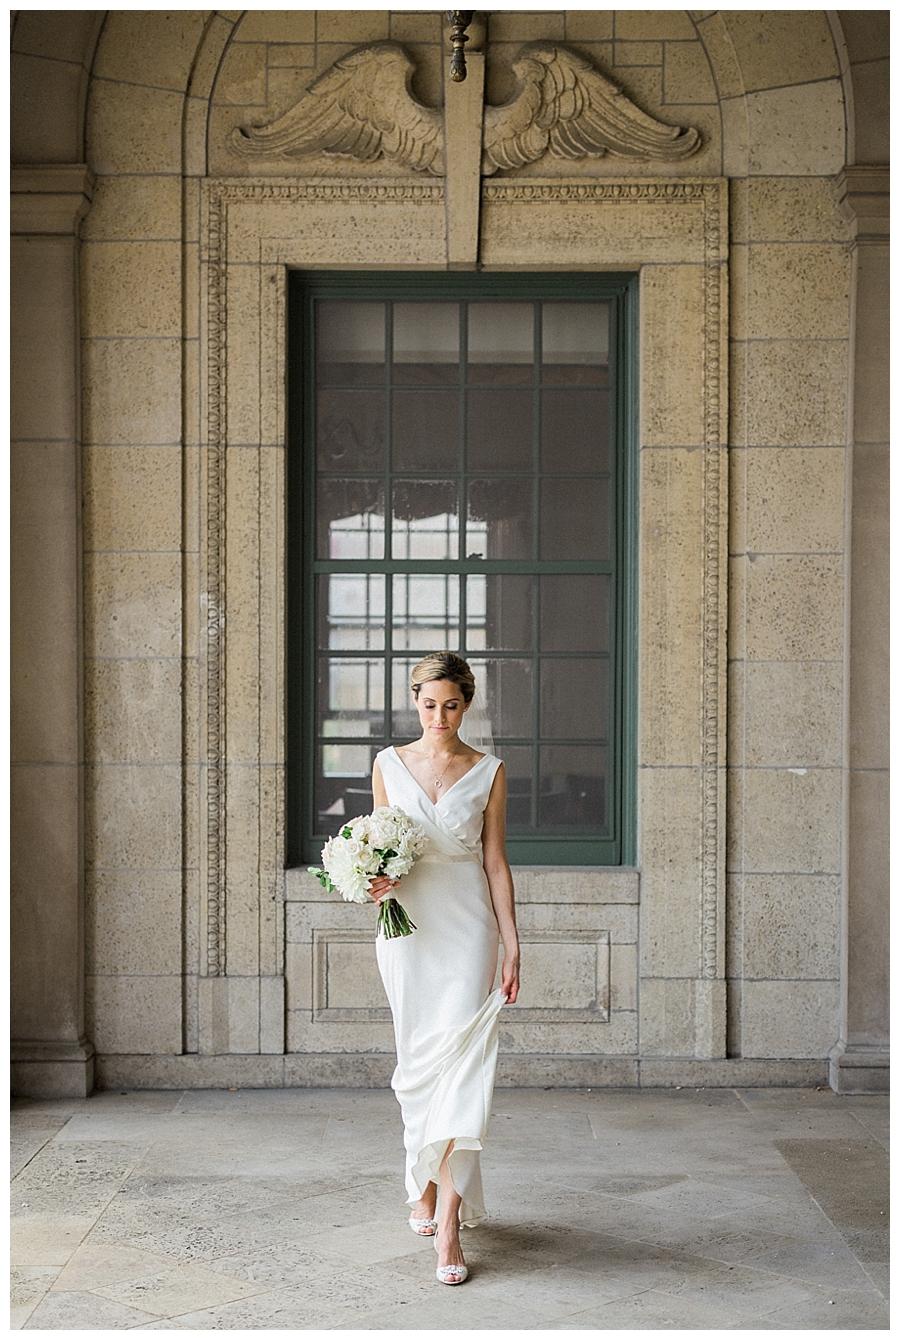 fine art wedding photography at UW Memorial Union in Madison, Wisconsin